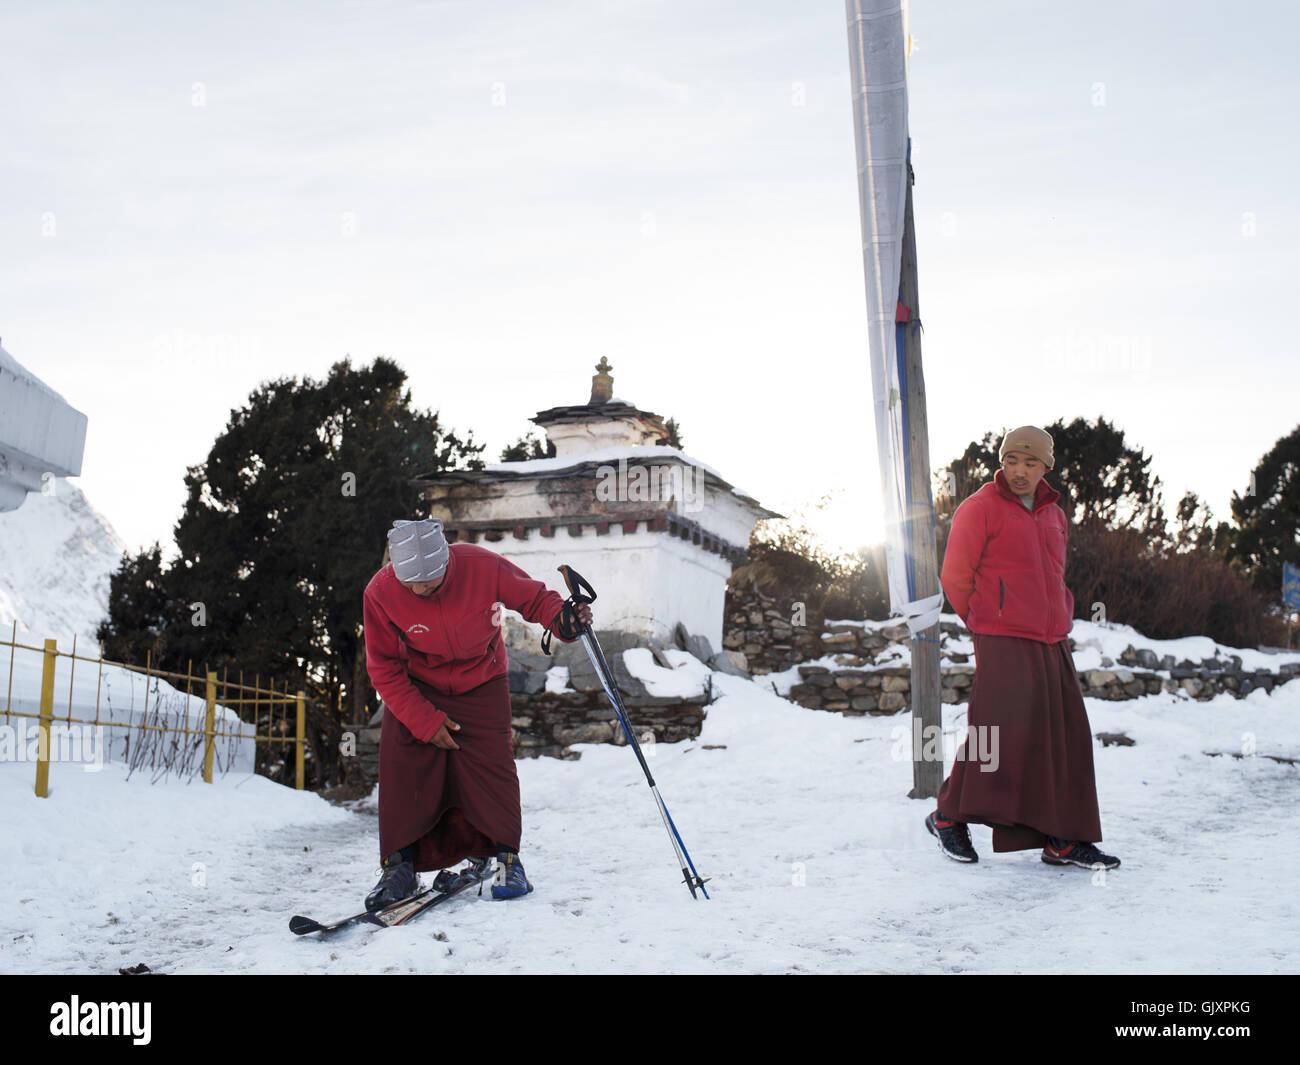 Monks ski in a monastery near Tengboche, Nepal - Stock Image